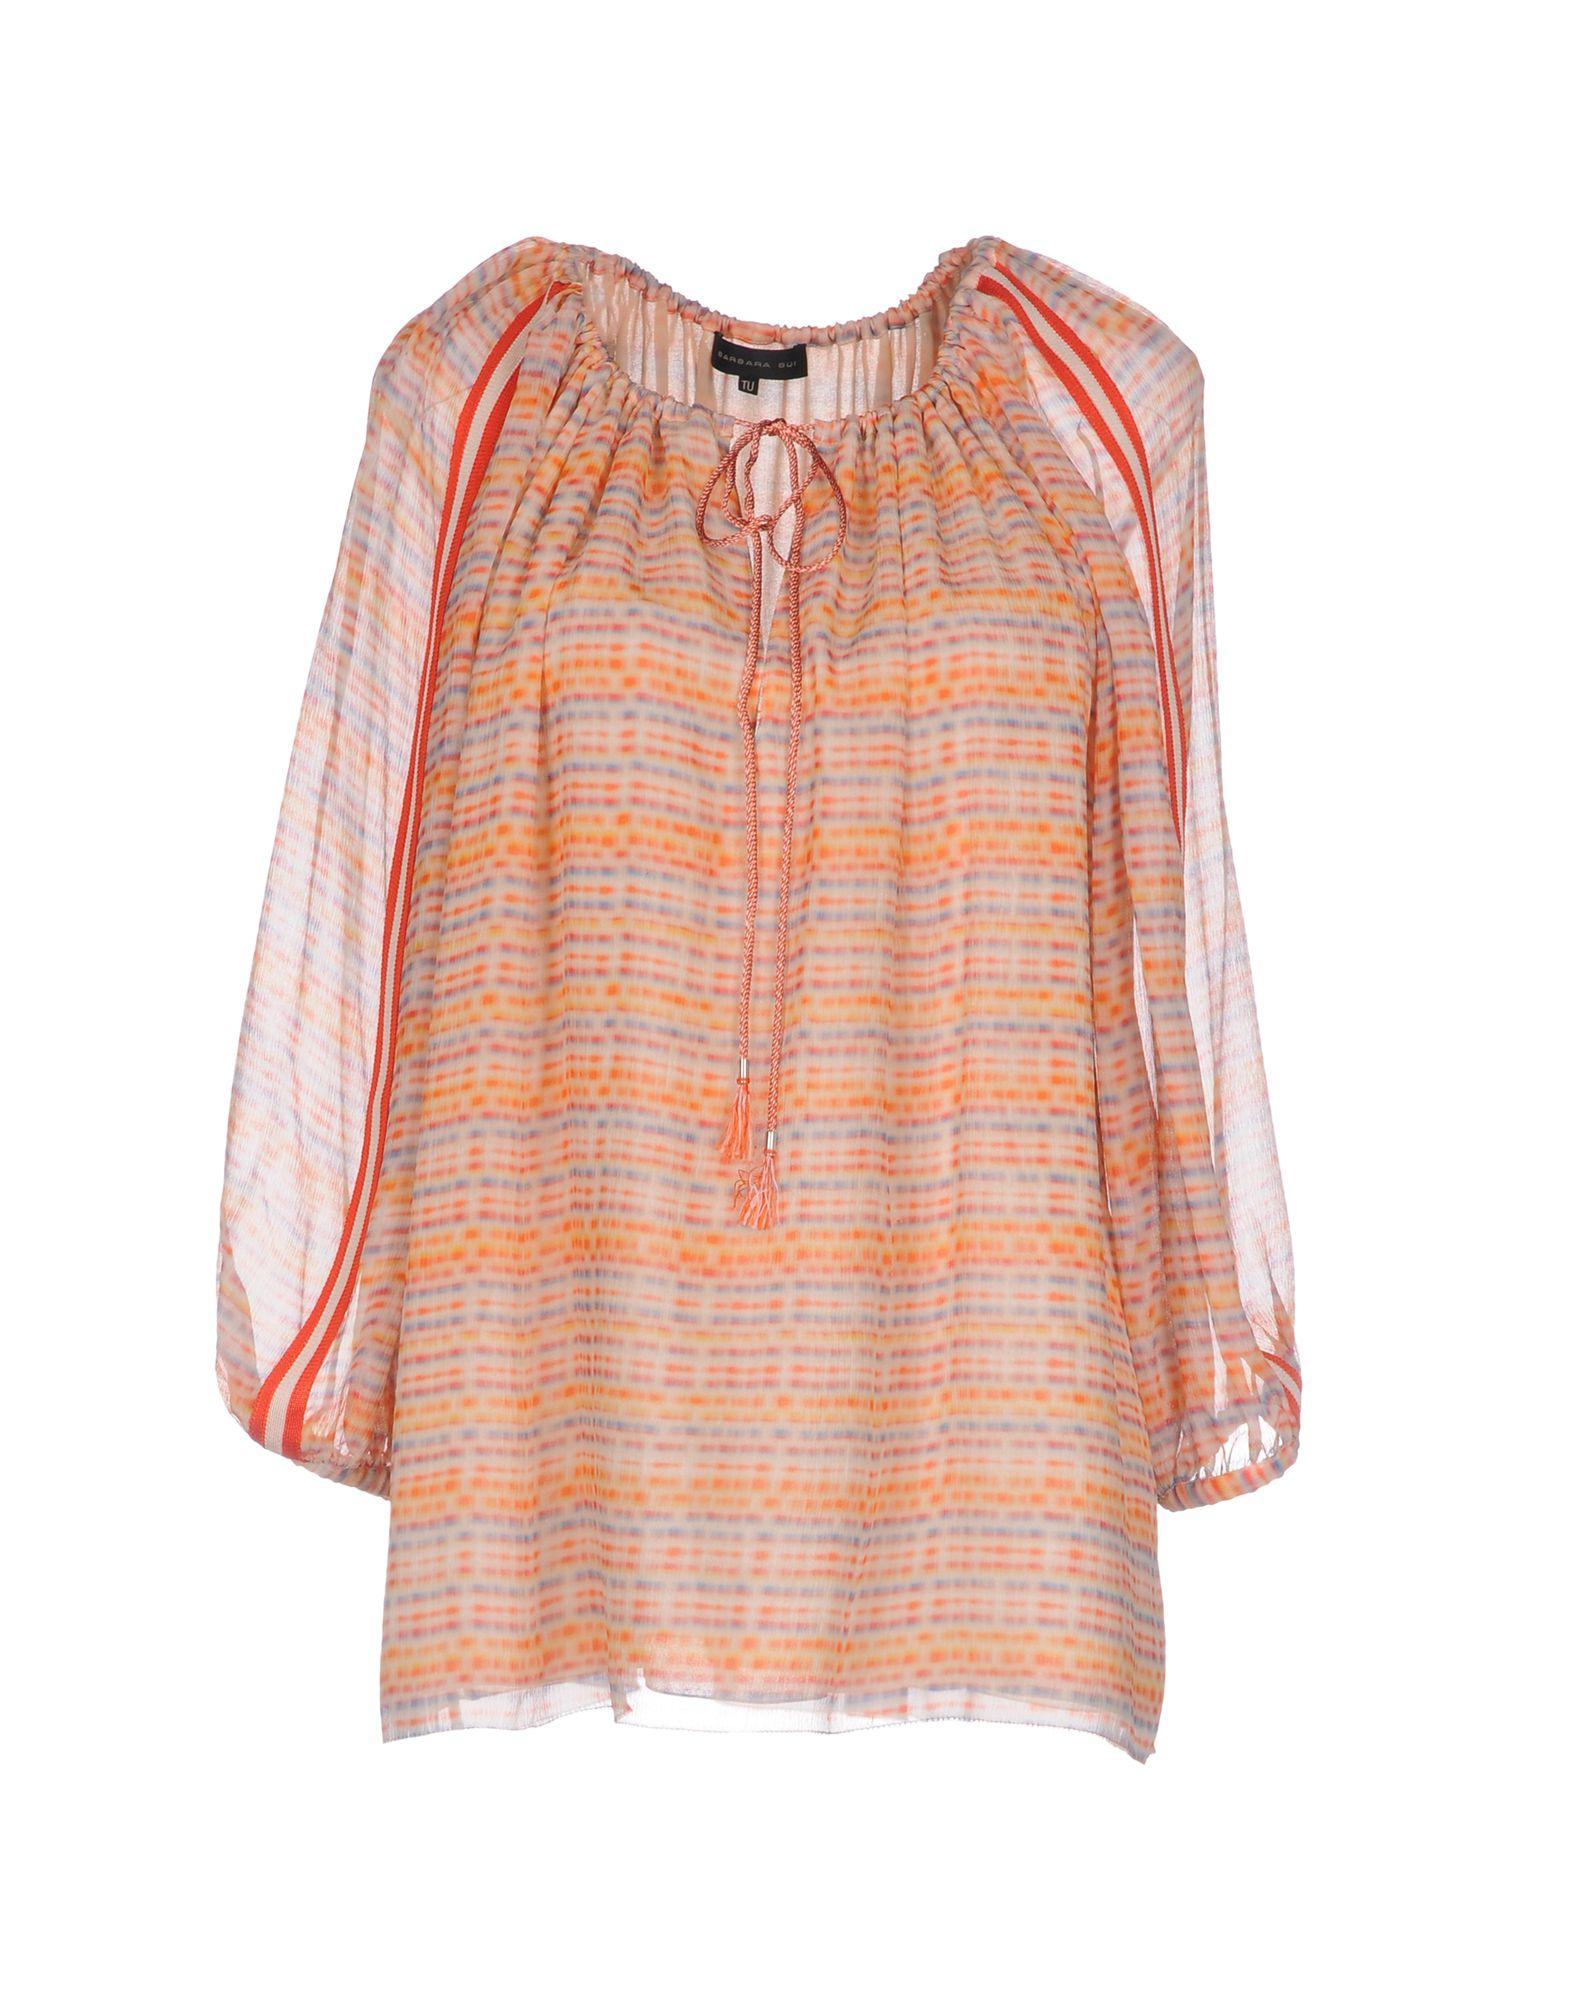 BARBARA BUI Damen Bluse Farbe Orange Größe 1